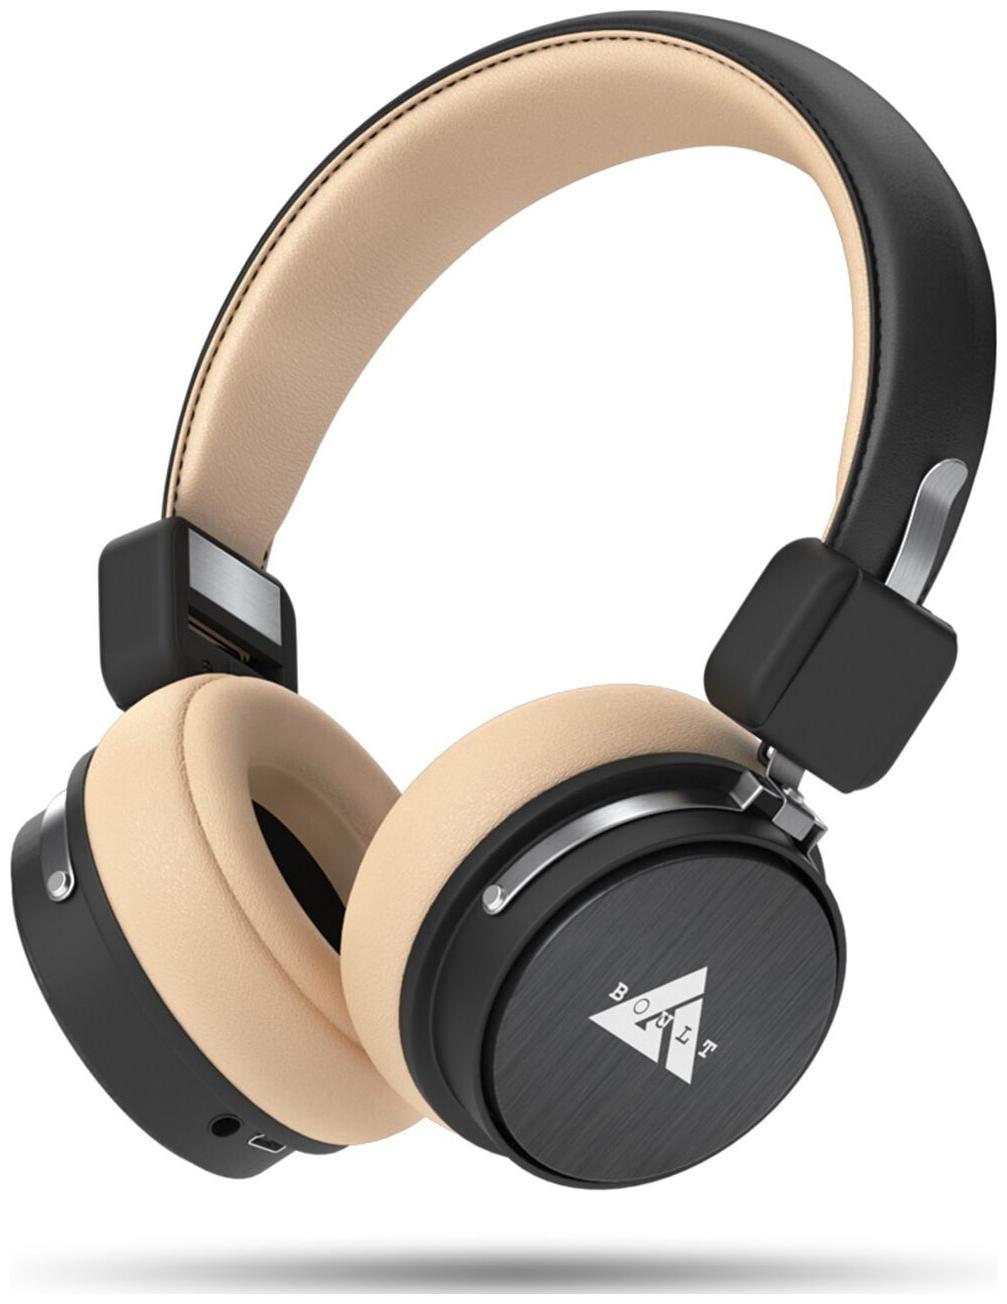 Boult Audio ProBass Flex Over-Ear Wireless Bluetooth Headphones (Black)